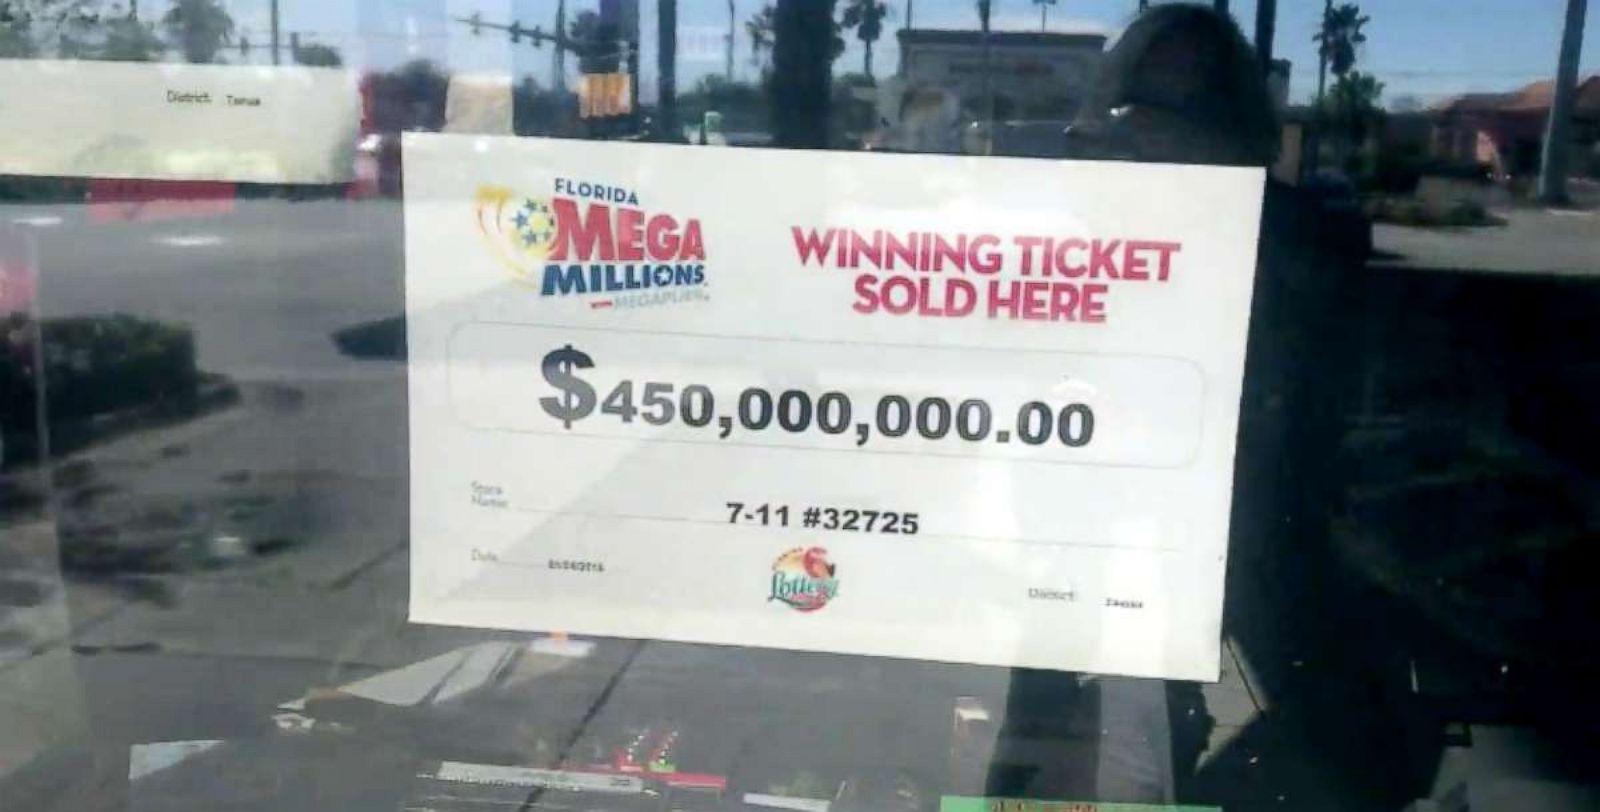 Mega Millions jackpot winner in Florida remains a mystery